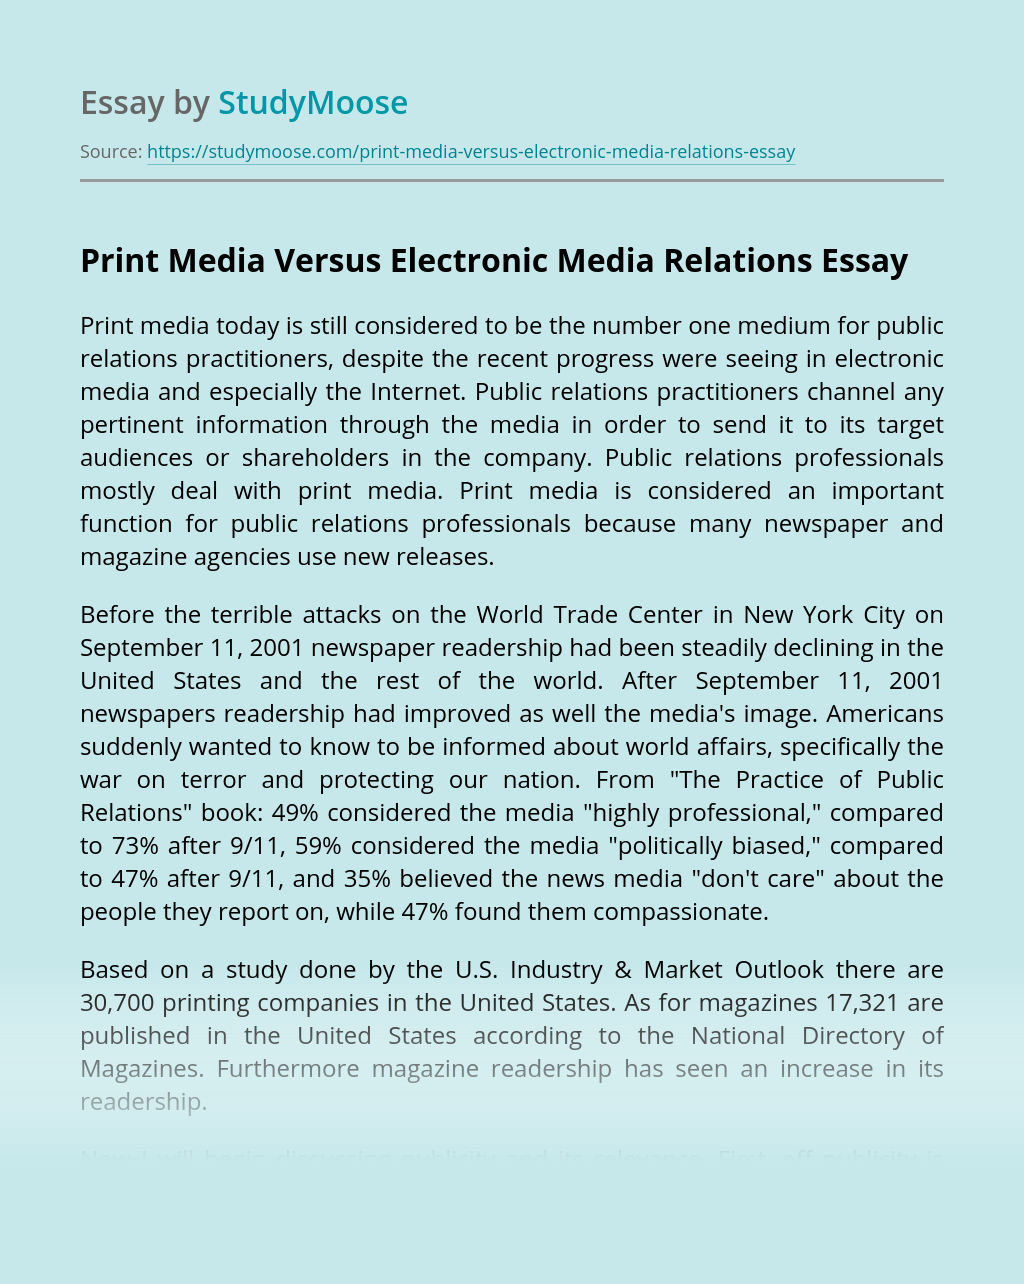 Print Media Versus Electronic Media Relations